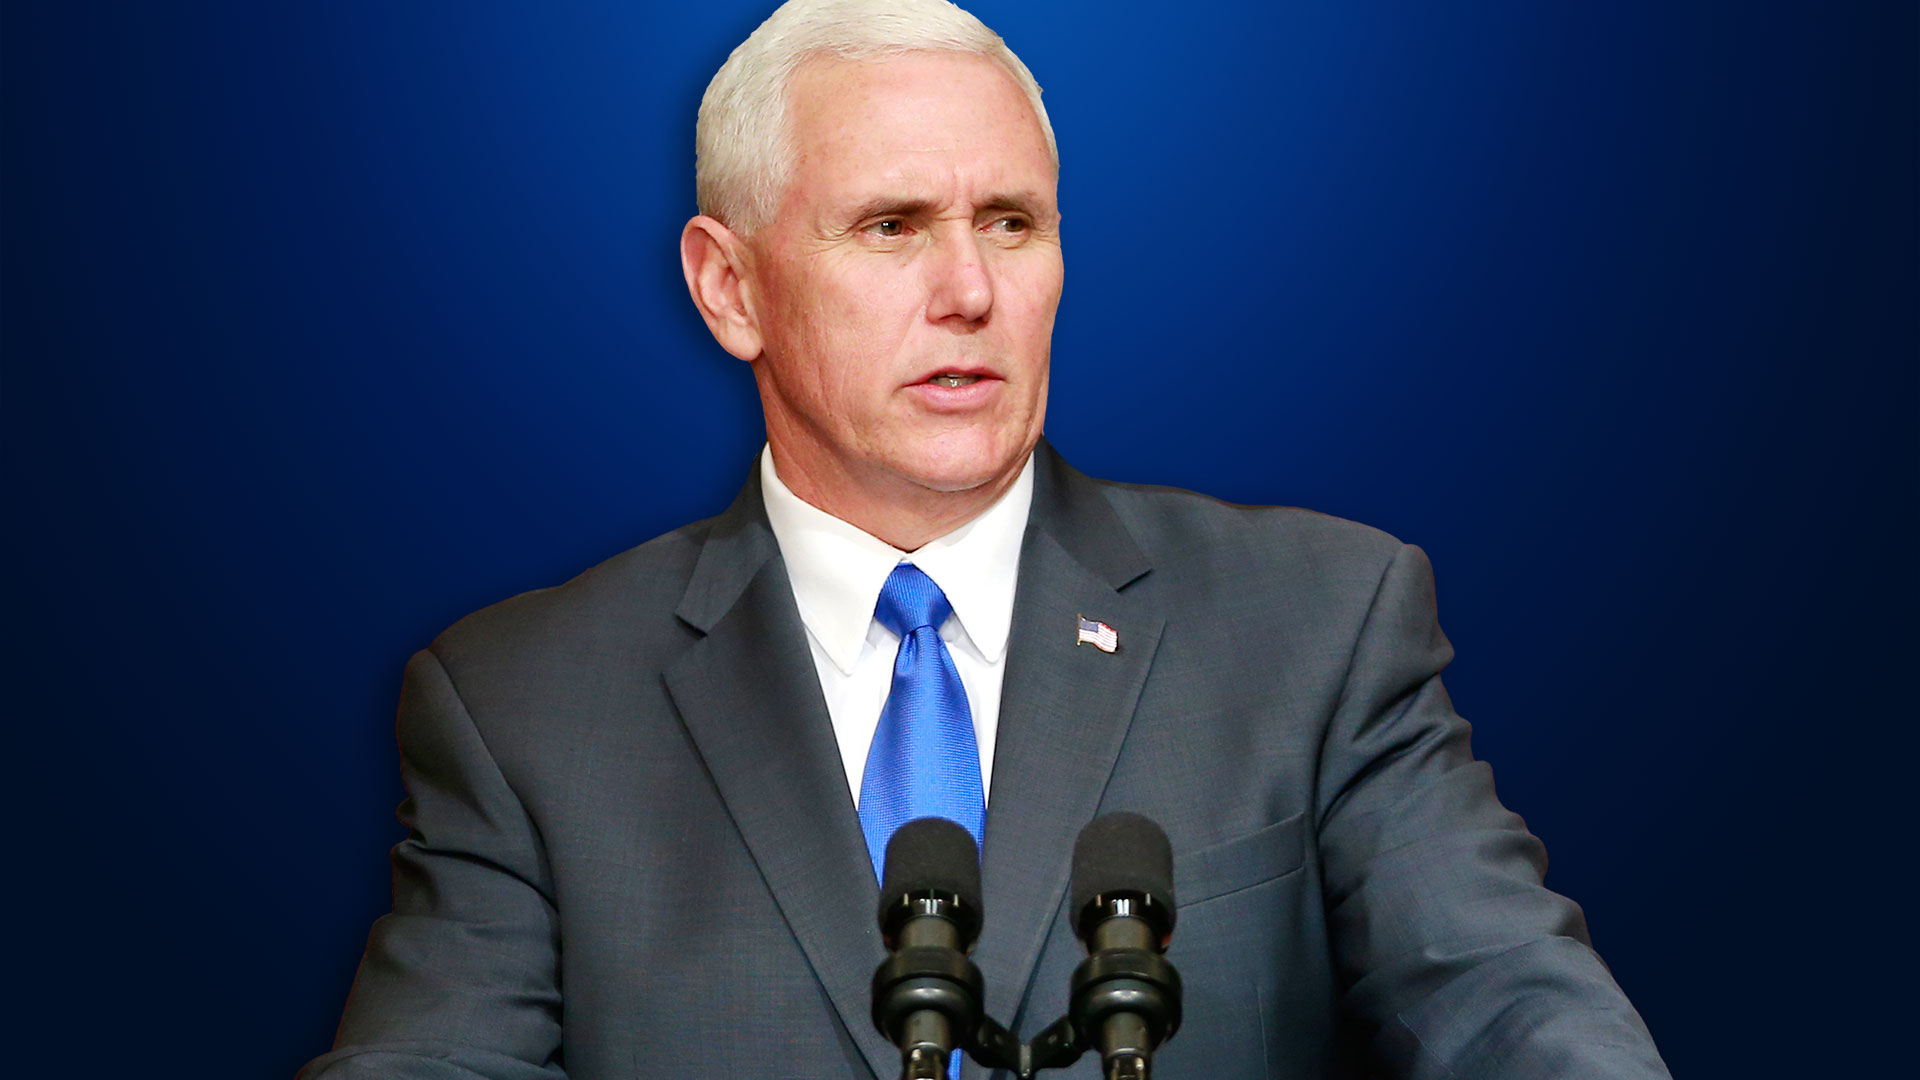 KELO Vice President Mike Pence 4